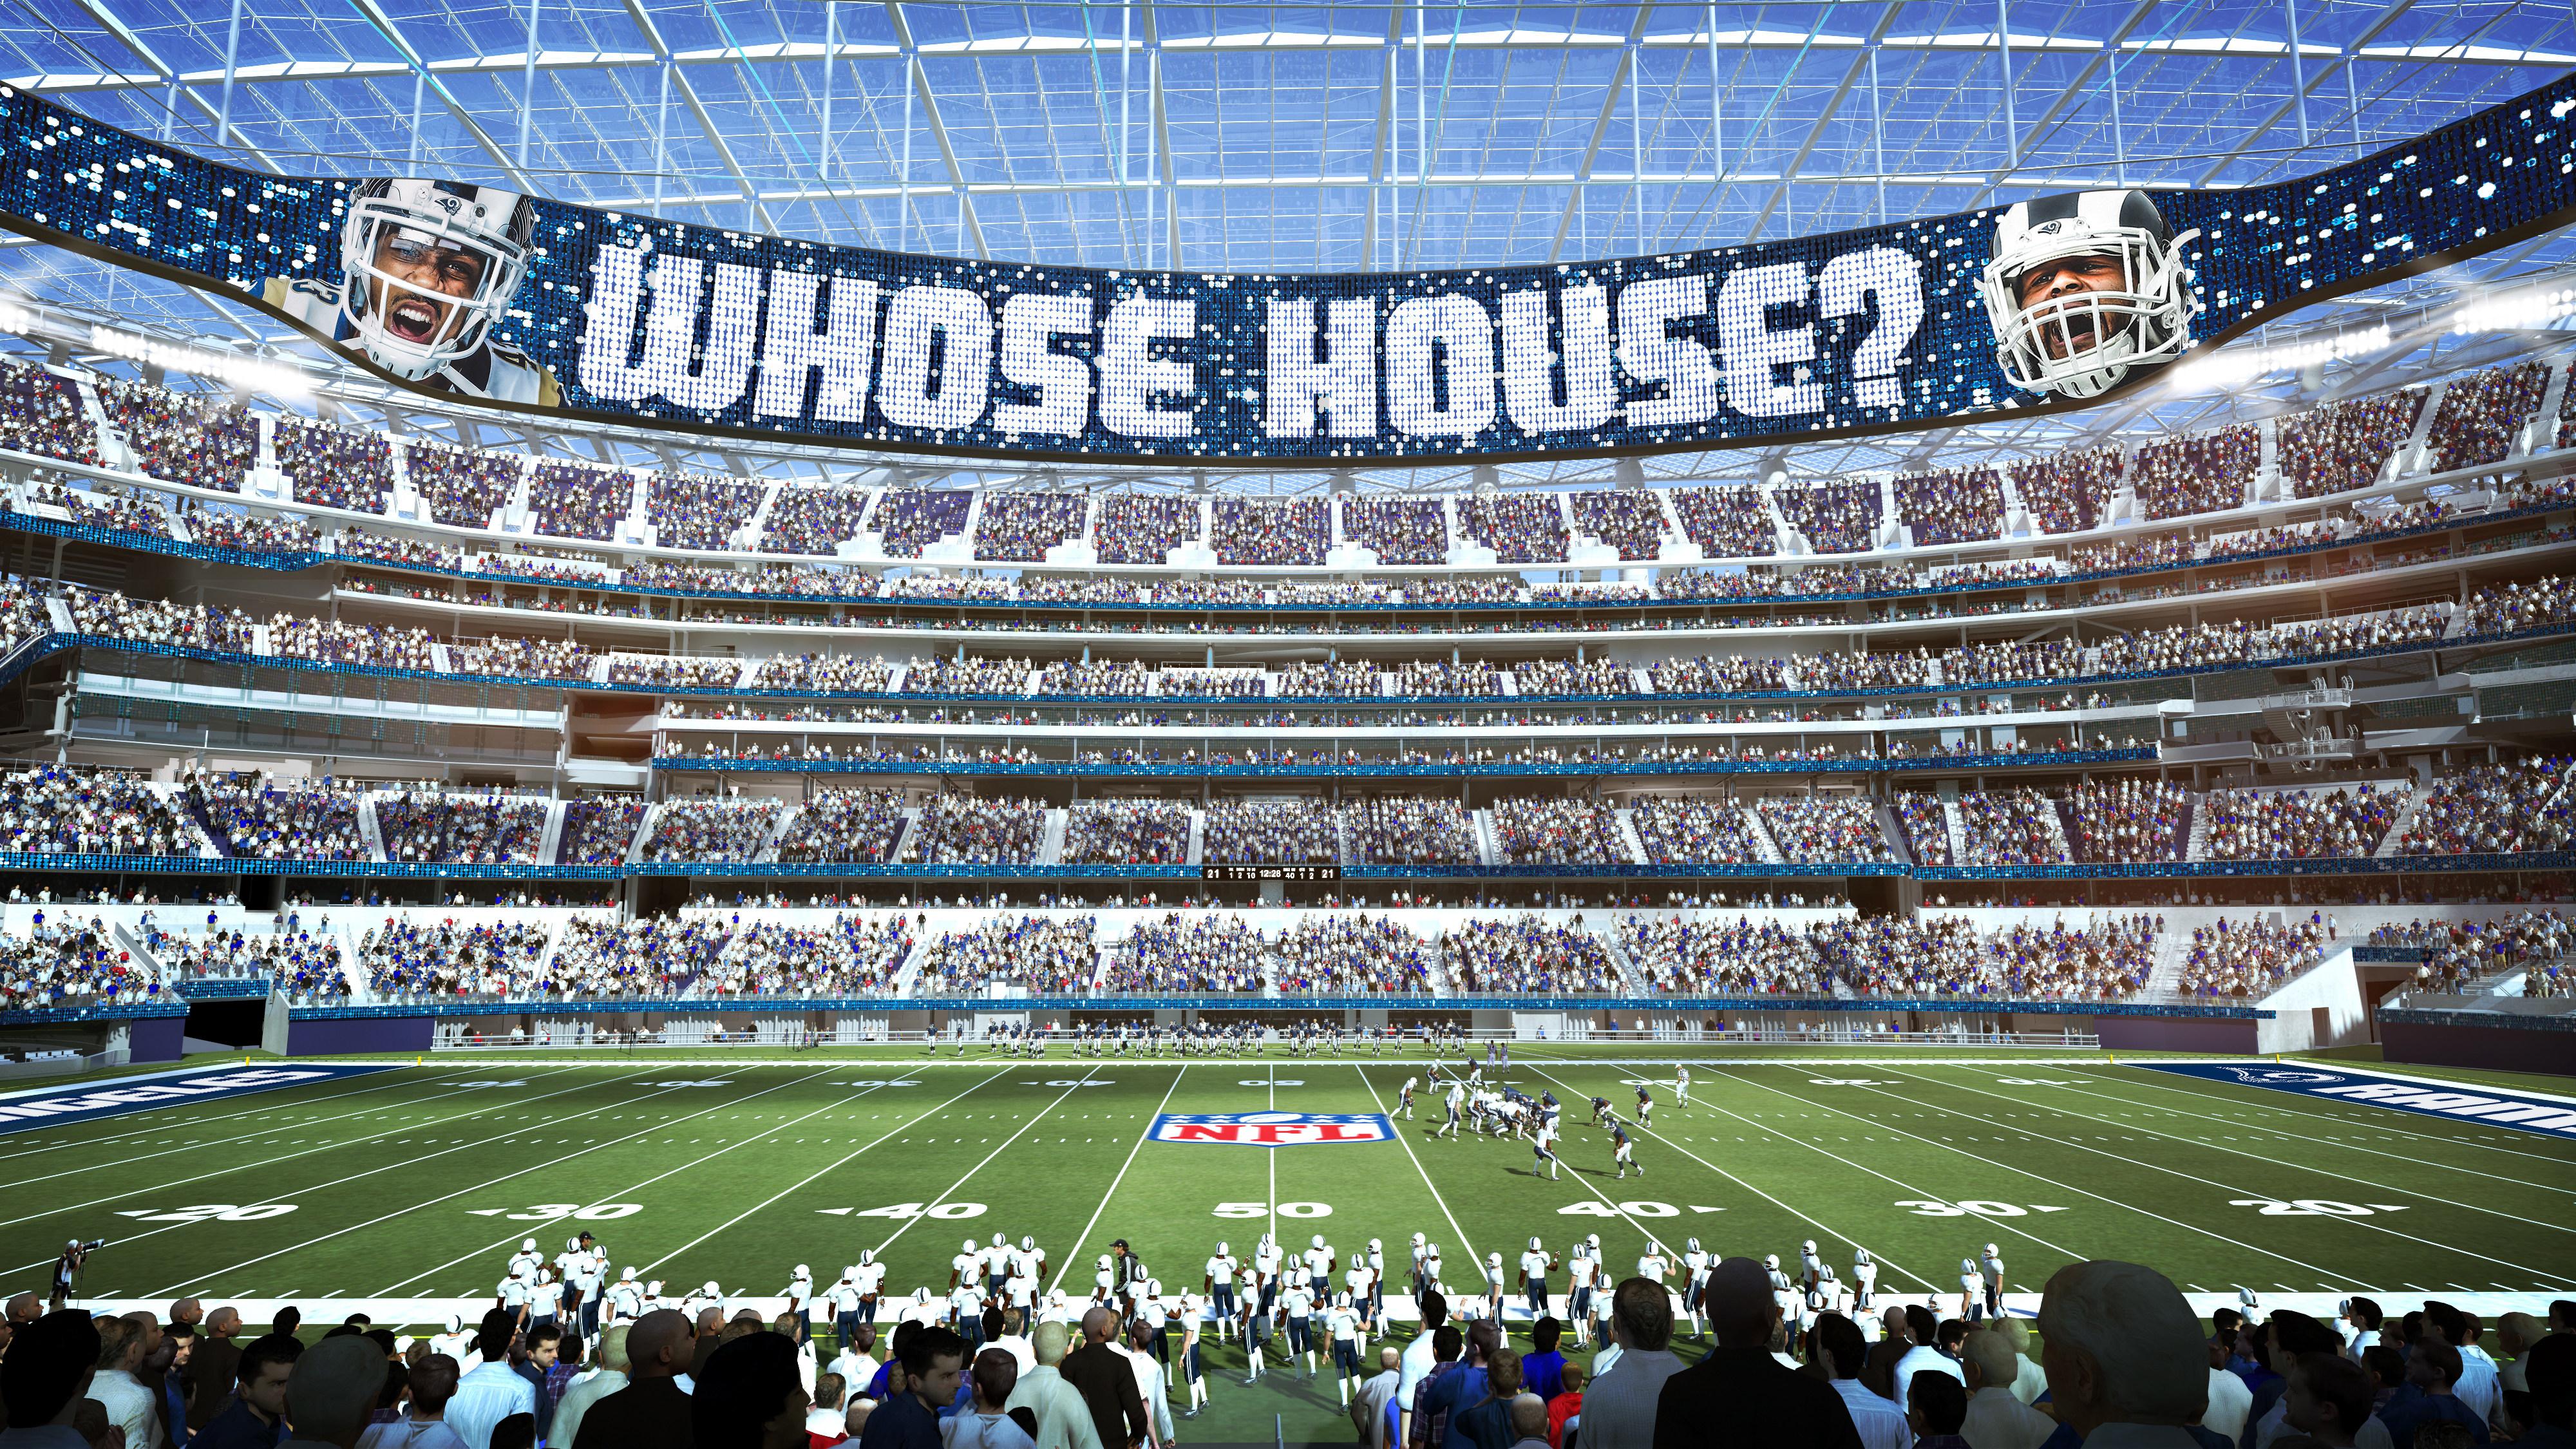 New La Stadium Los Angeles Rams Therams Com